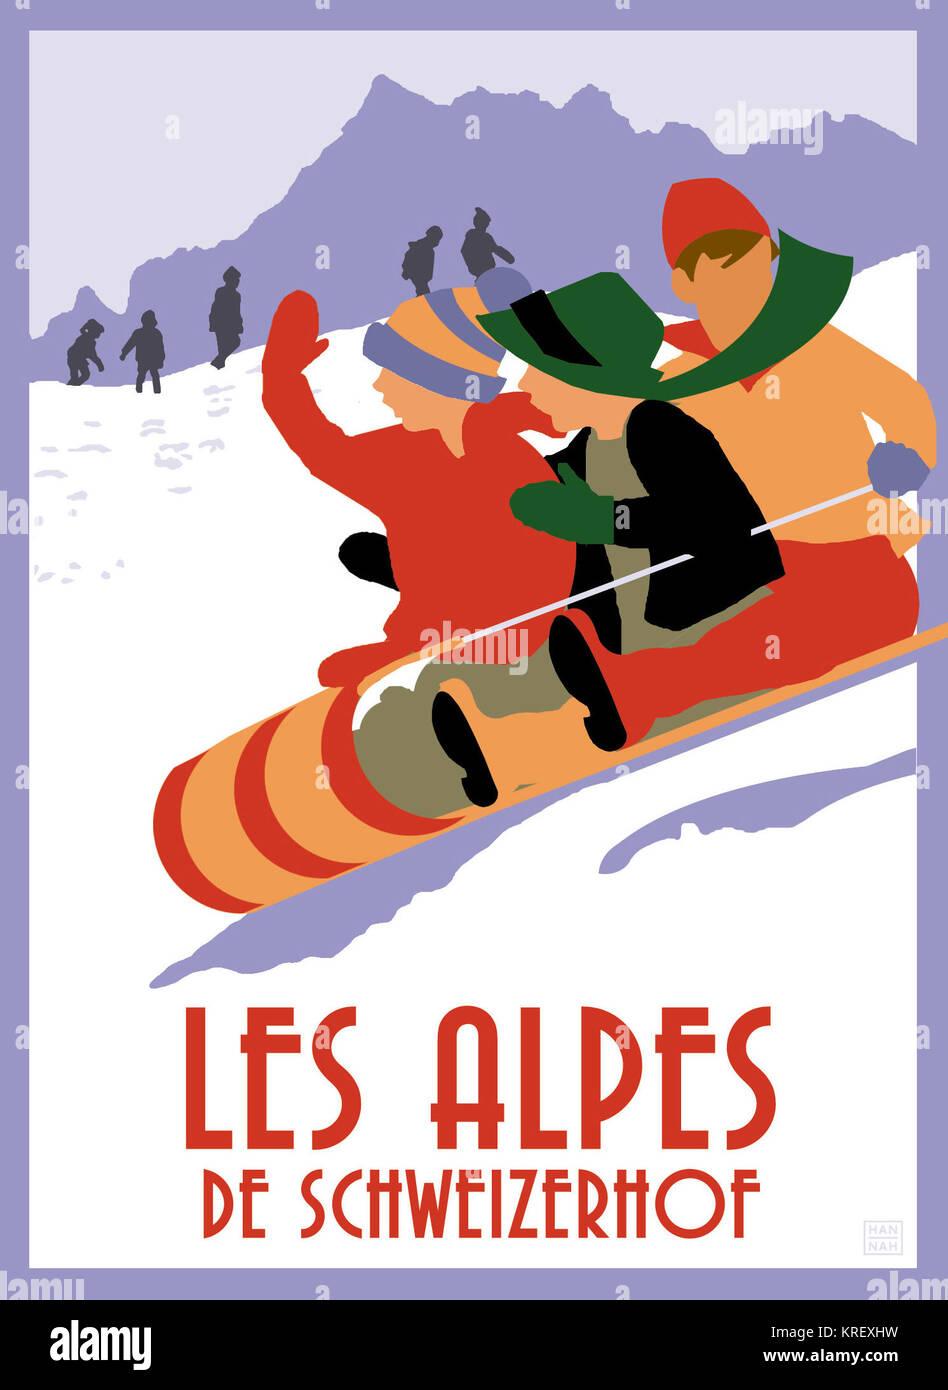 Les Alpes De Schweizerhof - Stock Image